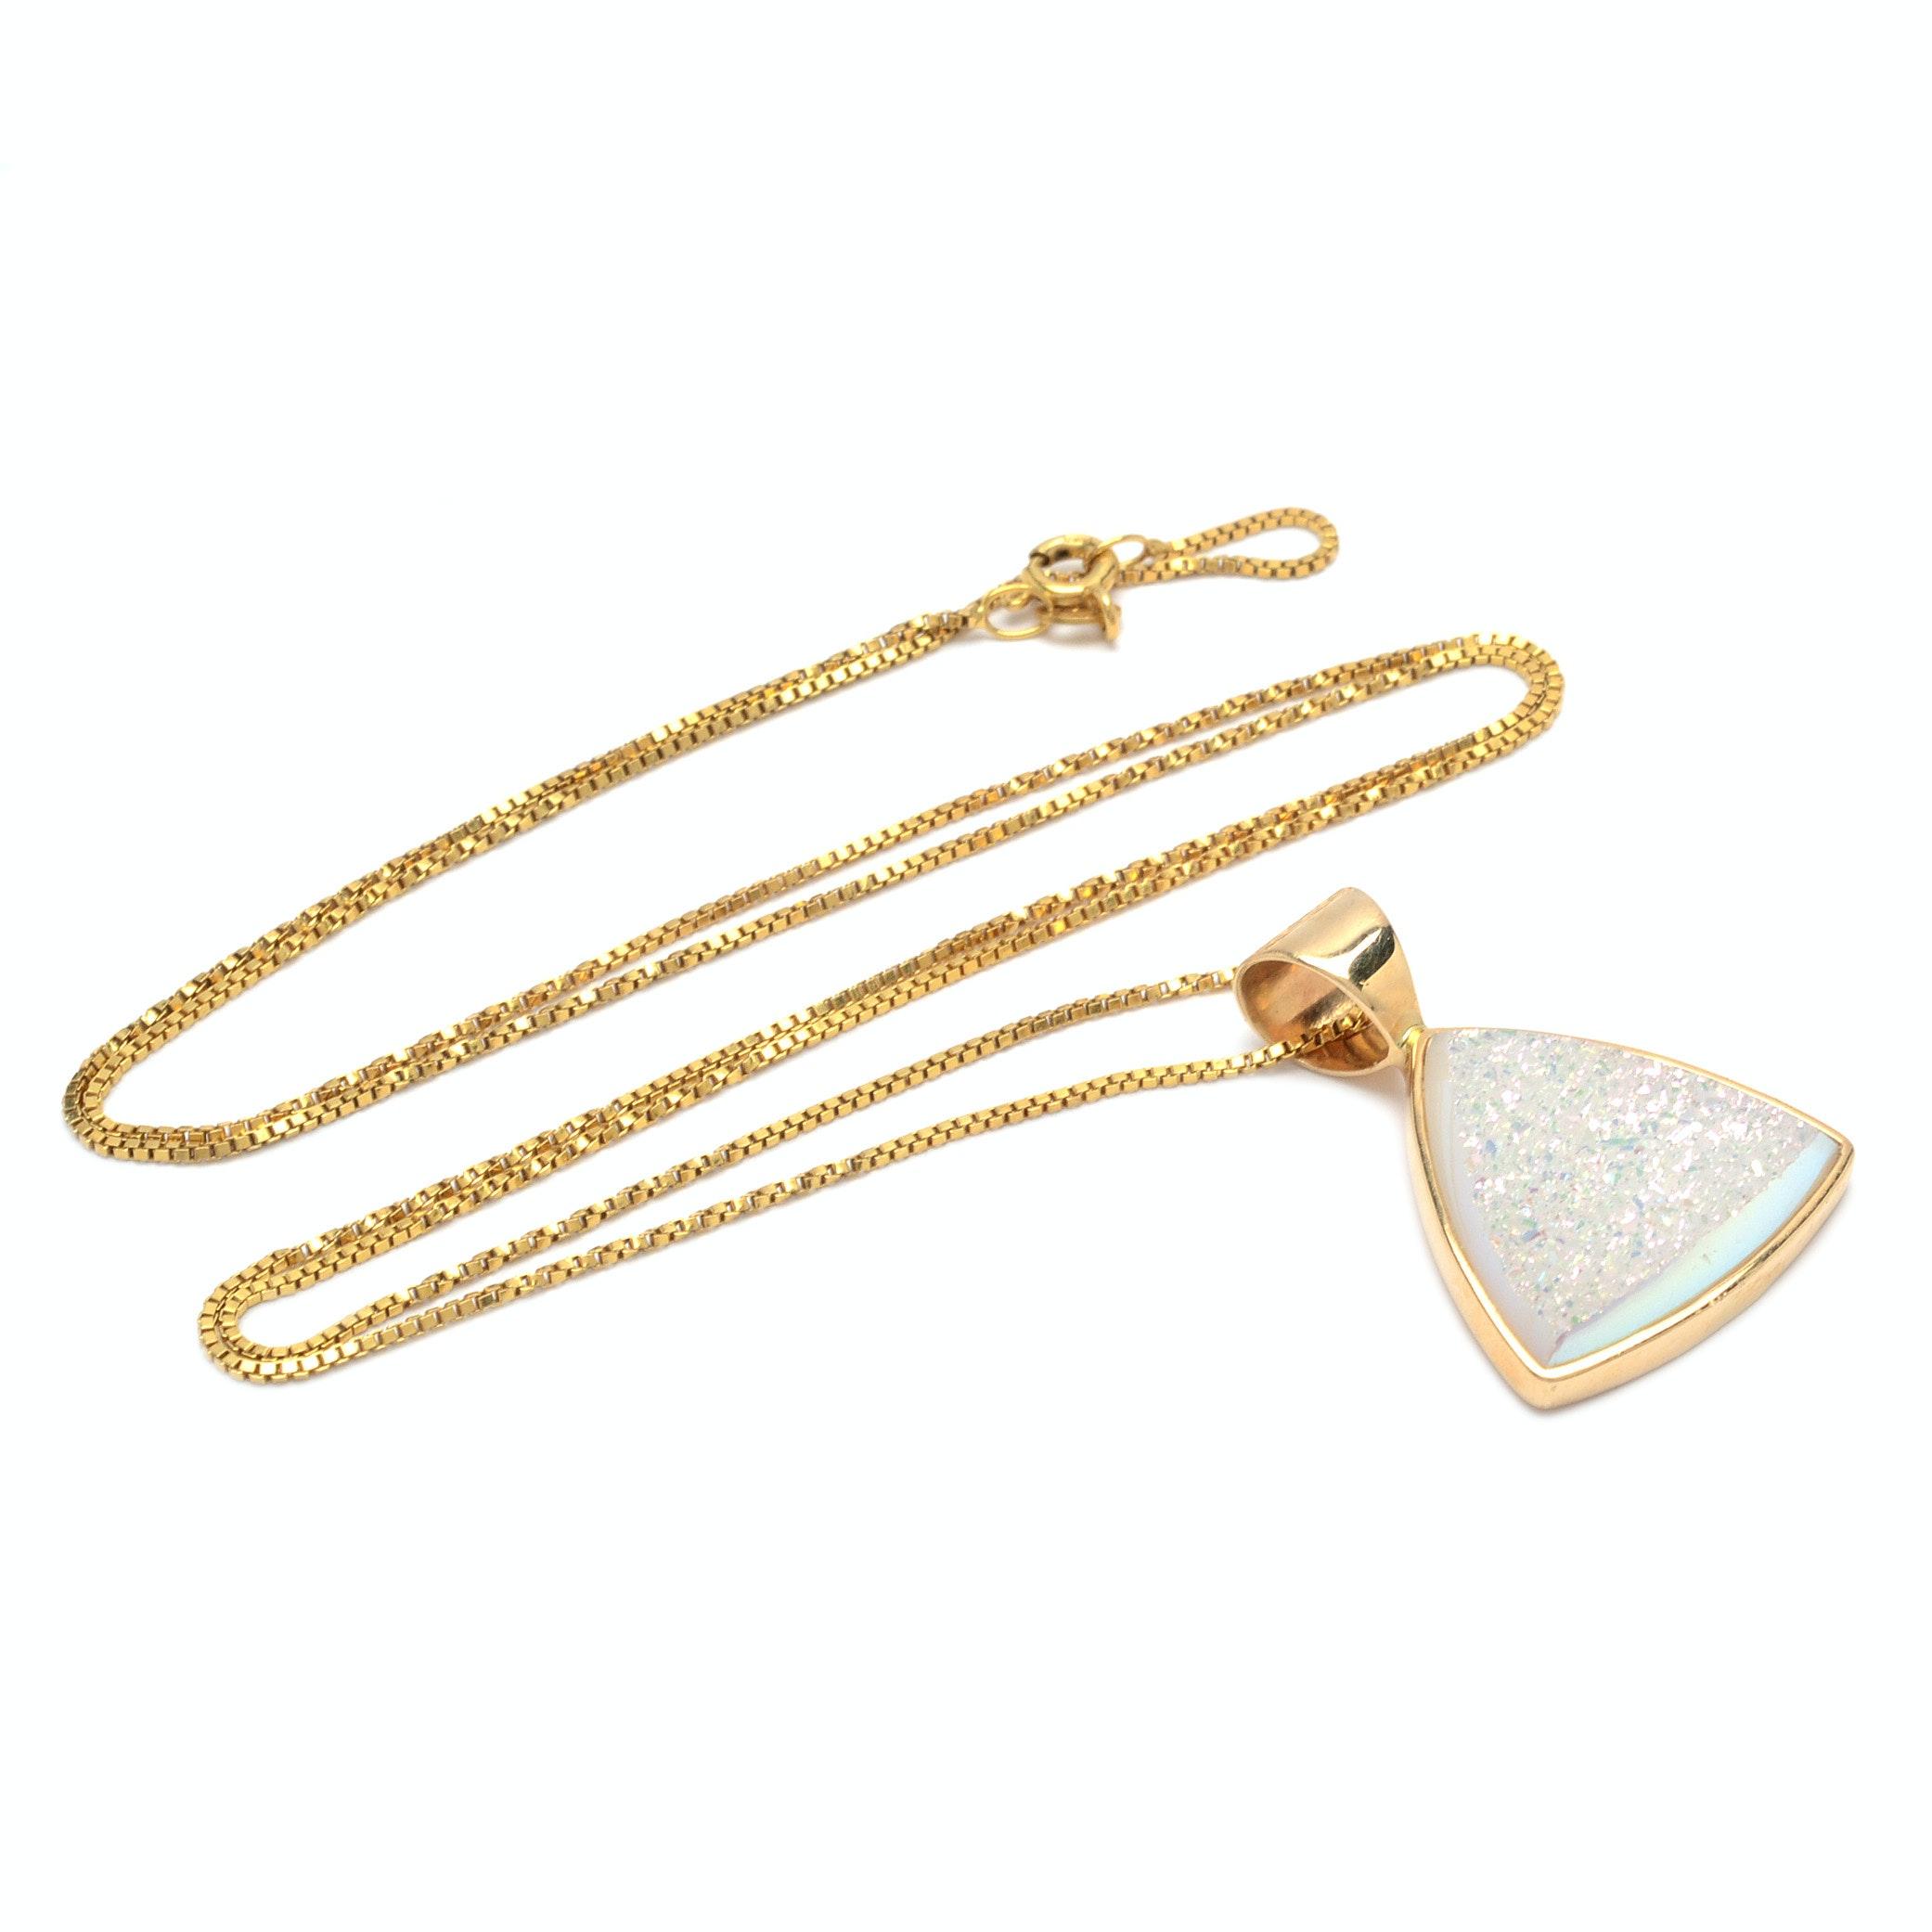 14K Yellow Gold Druzy Pendant Necklace